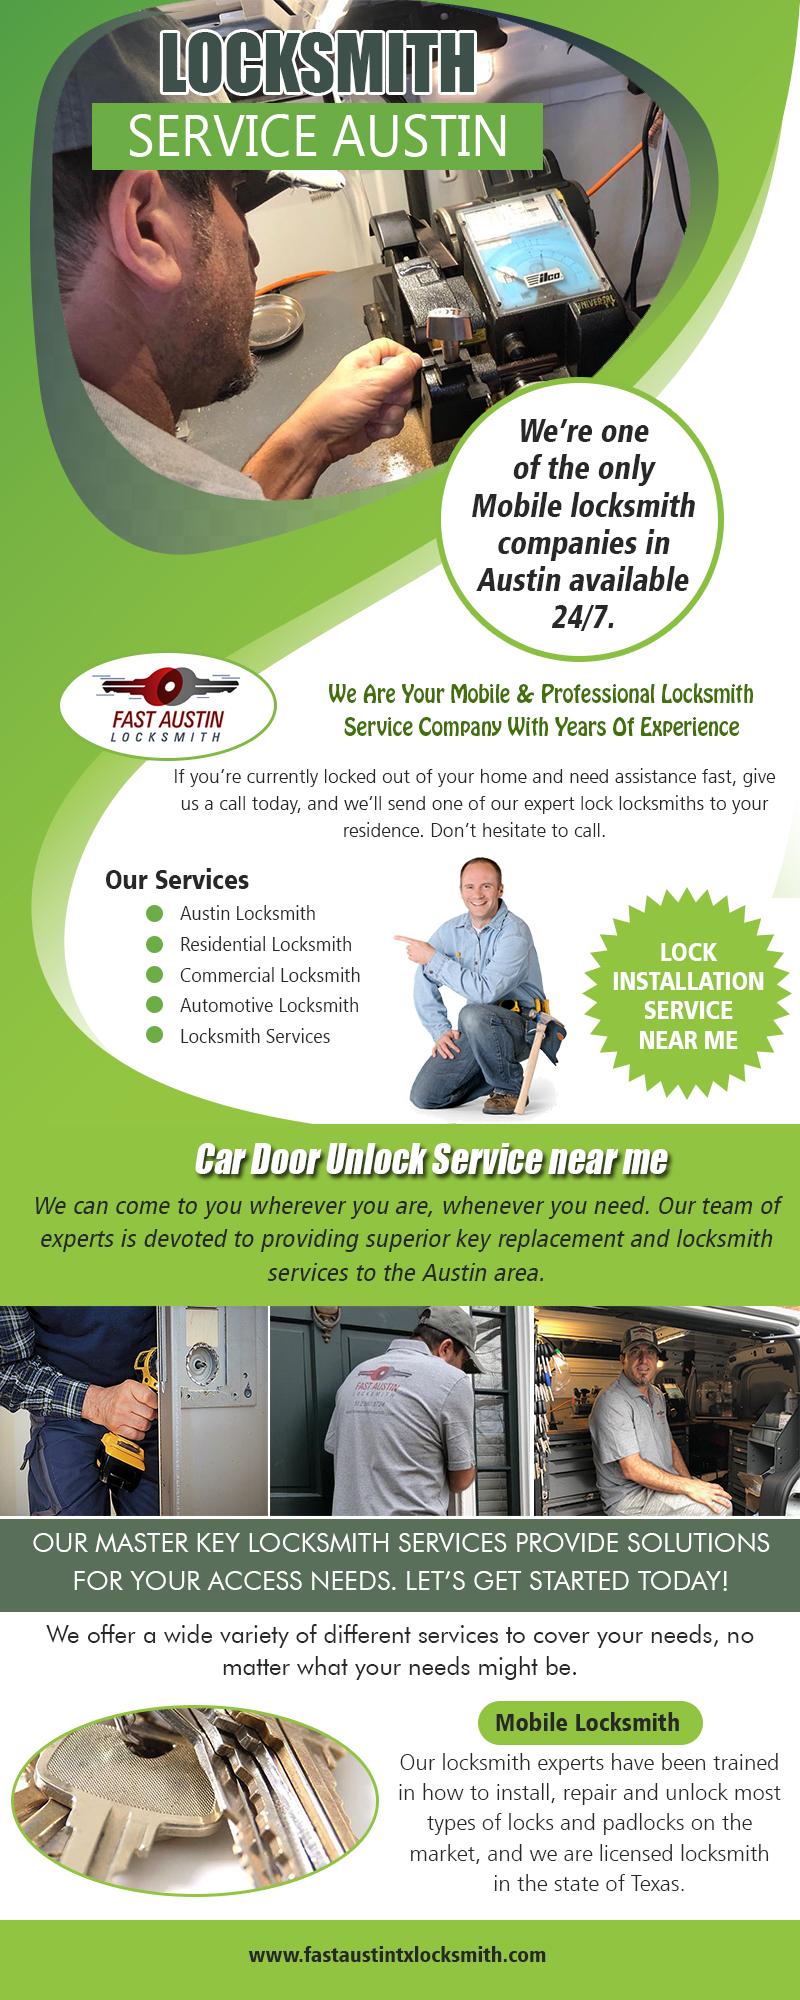 Locksmith Service Austin